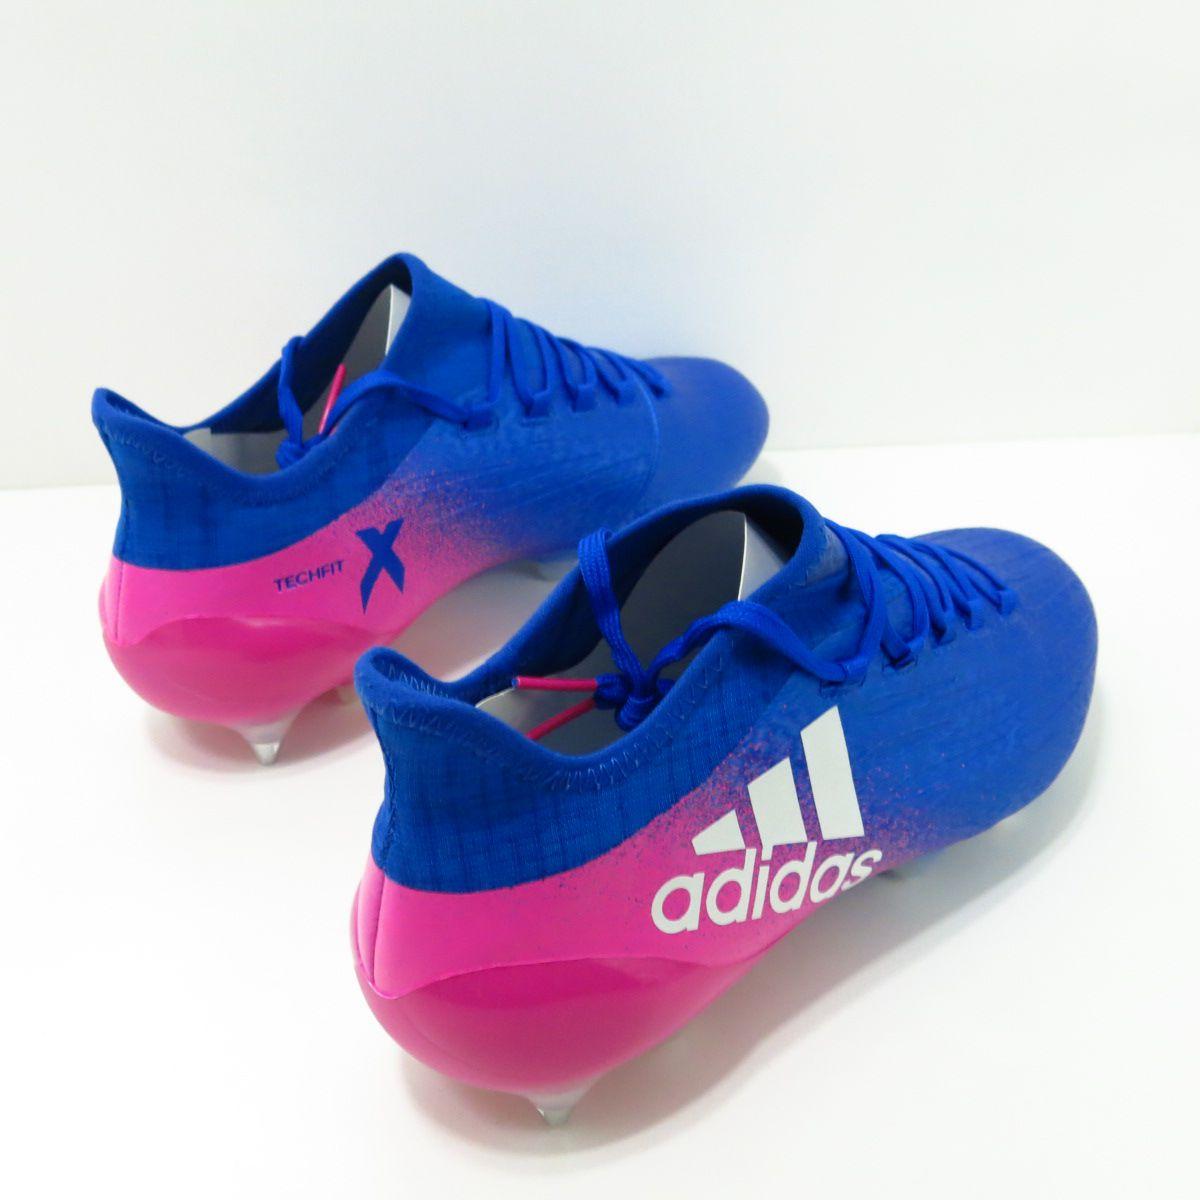 Chuteira Adidas X 16.1 SG Trava Mista